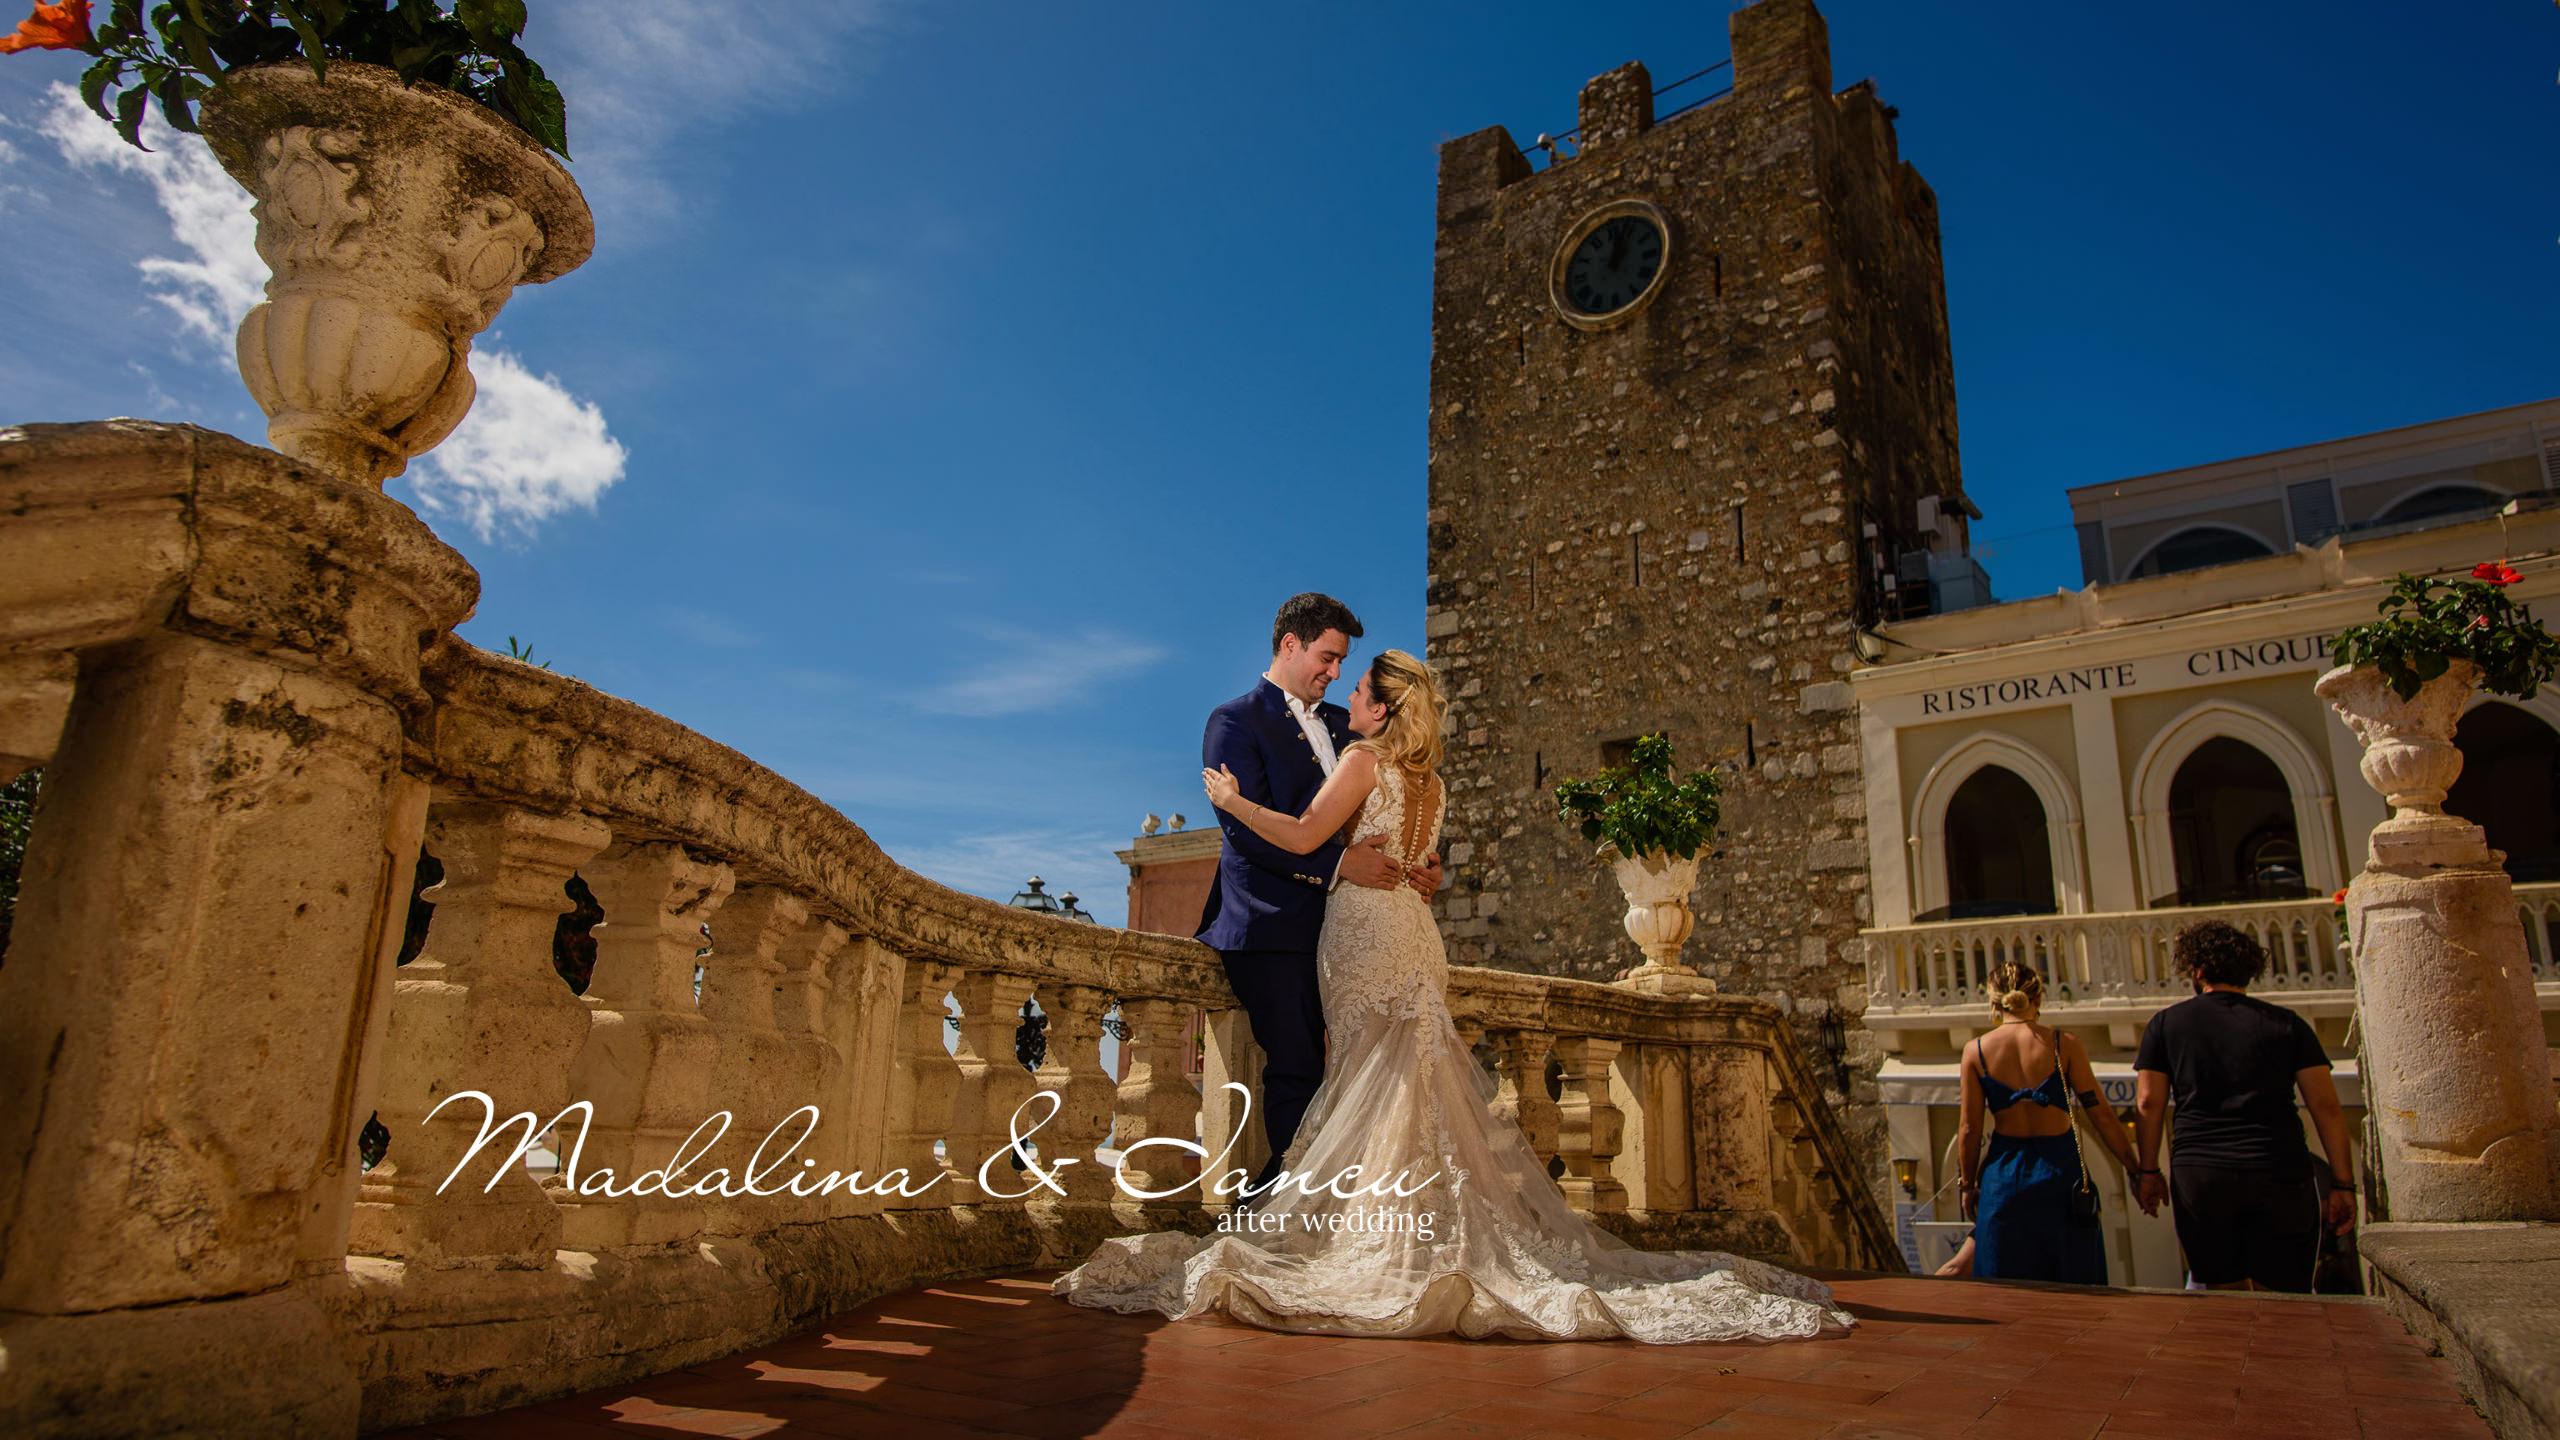 Filmare-Nunta-FotoTime-Filmare-Nunta-Sicilia-After-wedding-Sicilia-FotoTime